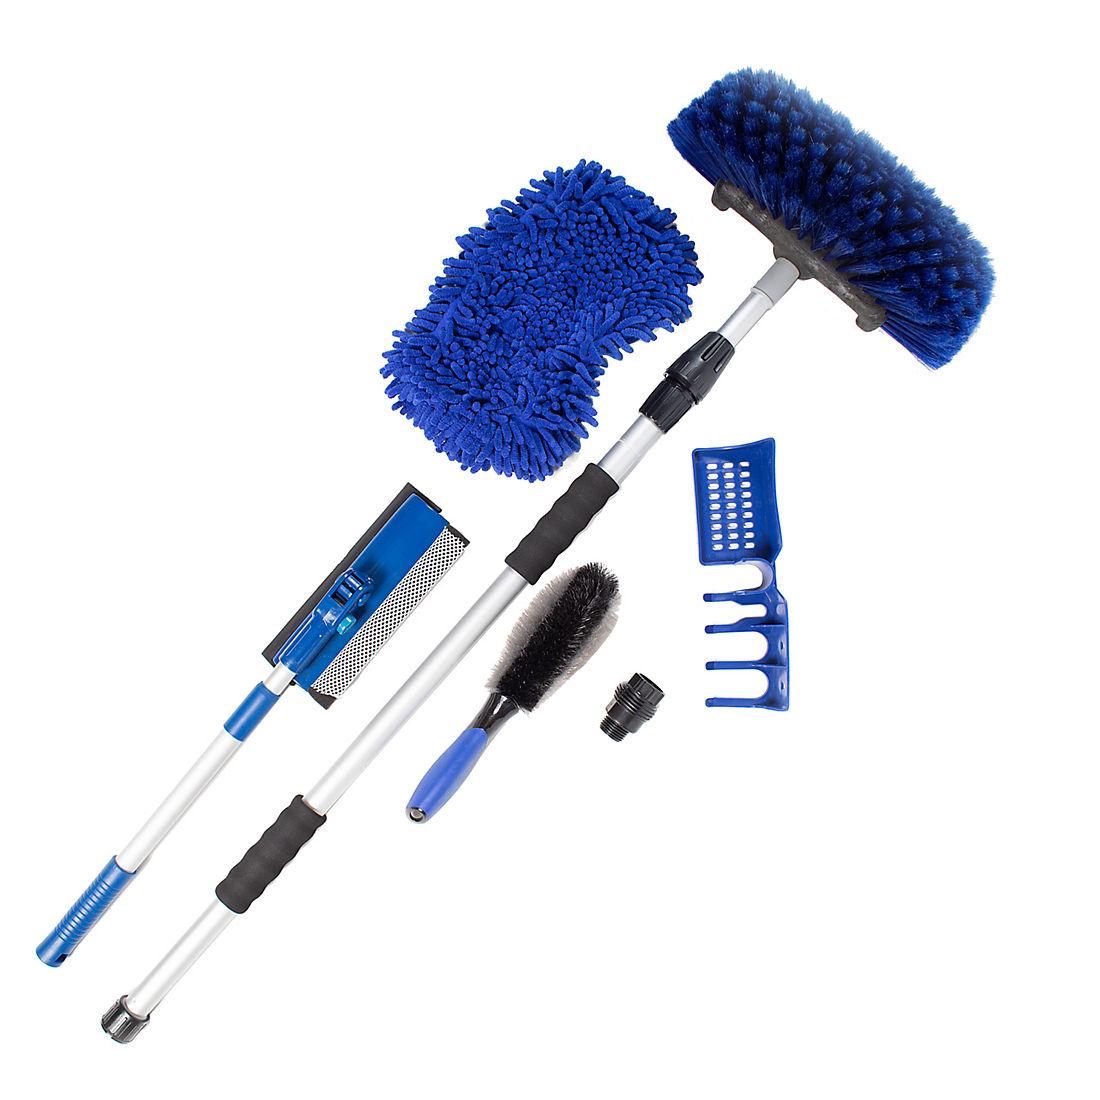 Car Wash Brush >> Myride 6 Pc All In One Car Wash Kit